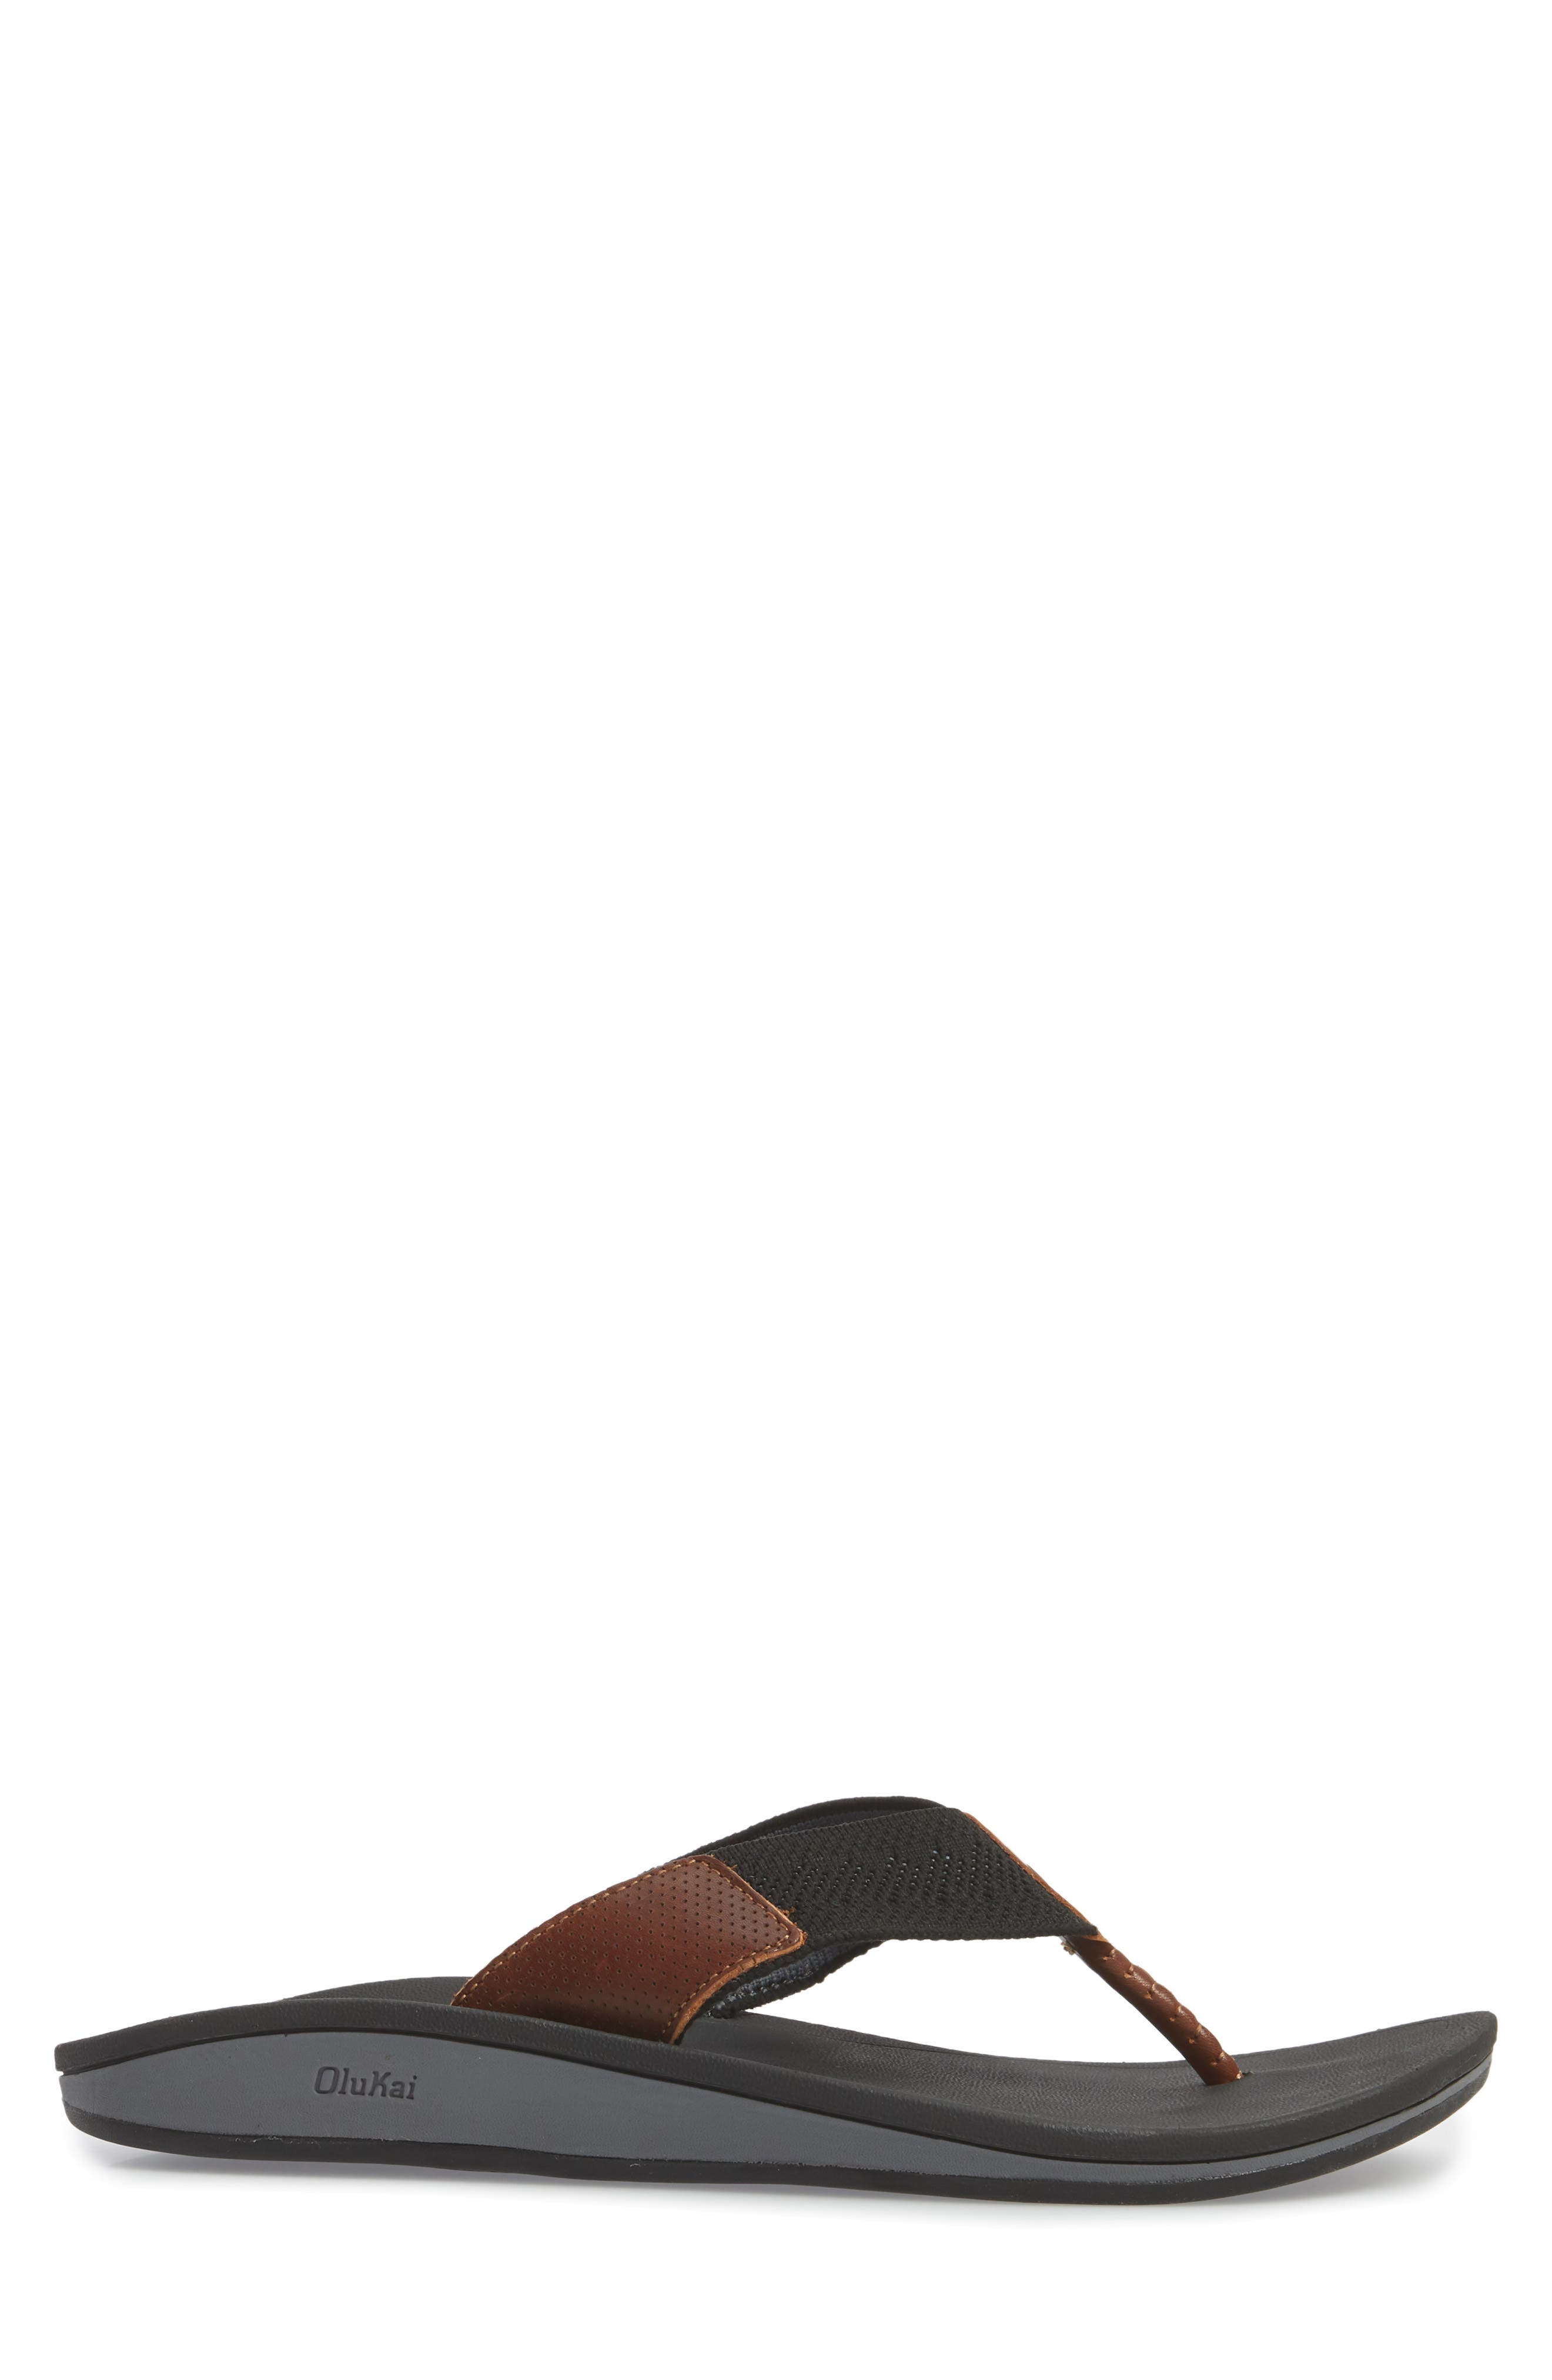 Nohona Ulana Flip Flop,                             Alternate thumbnail 3, color,                             BLACK/ BLACK LEATHER